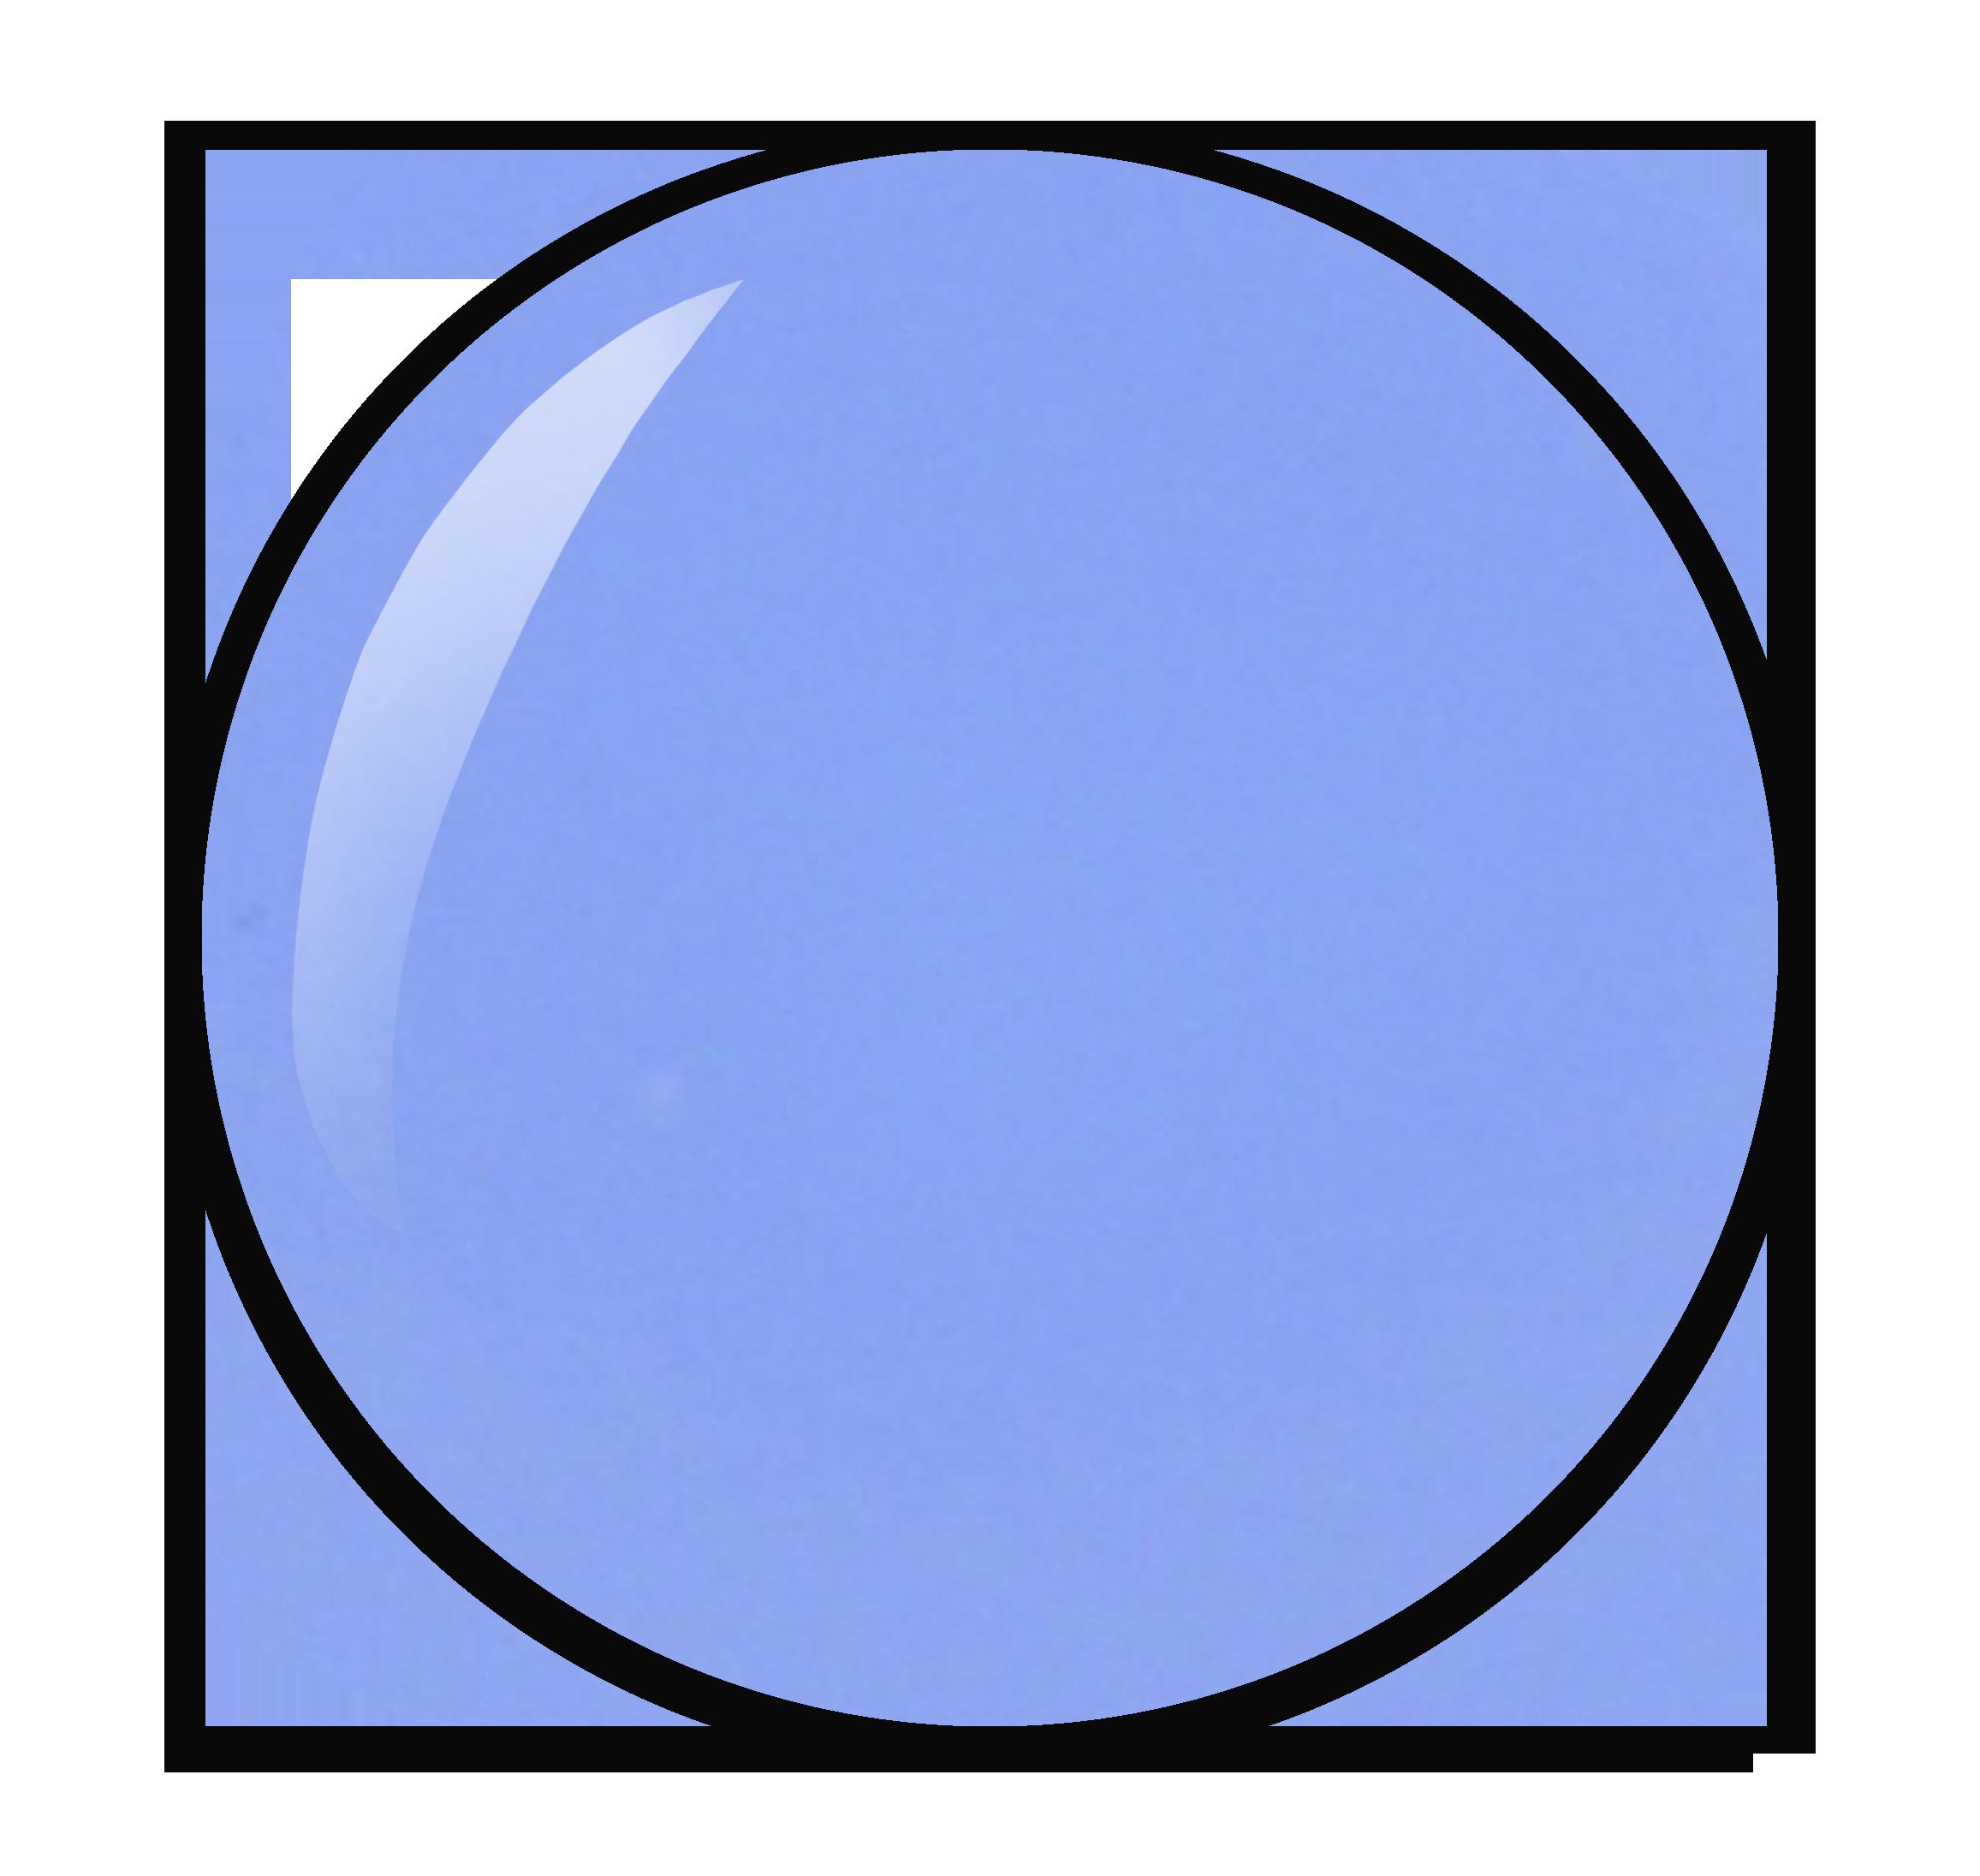 Herôme hemelsblauwe nagellak kleur nummer 51